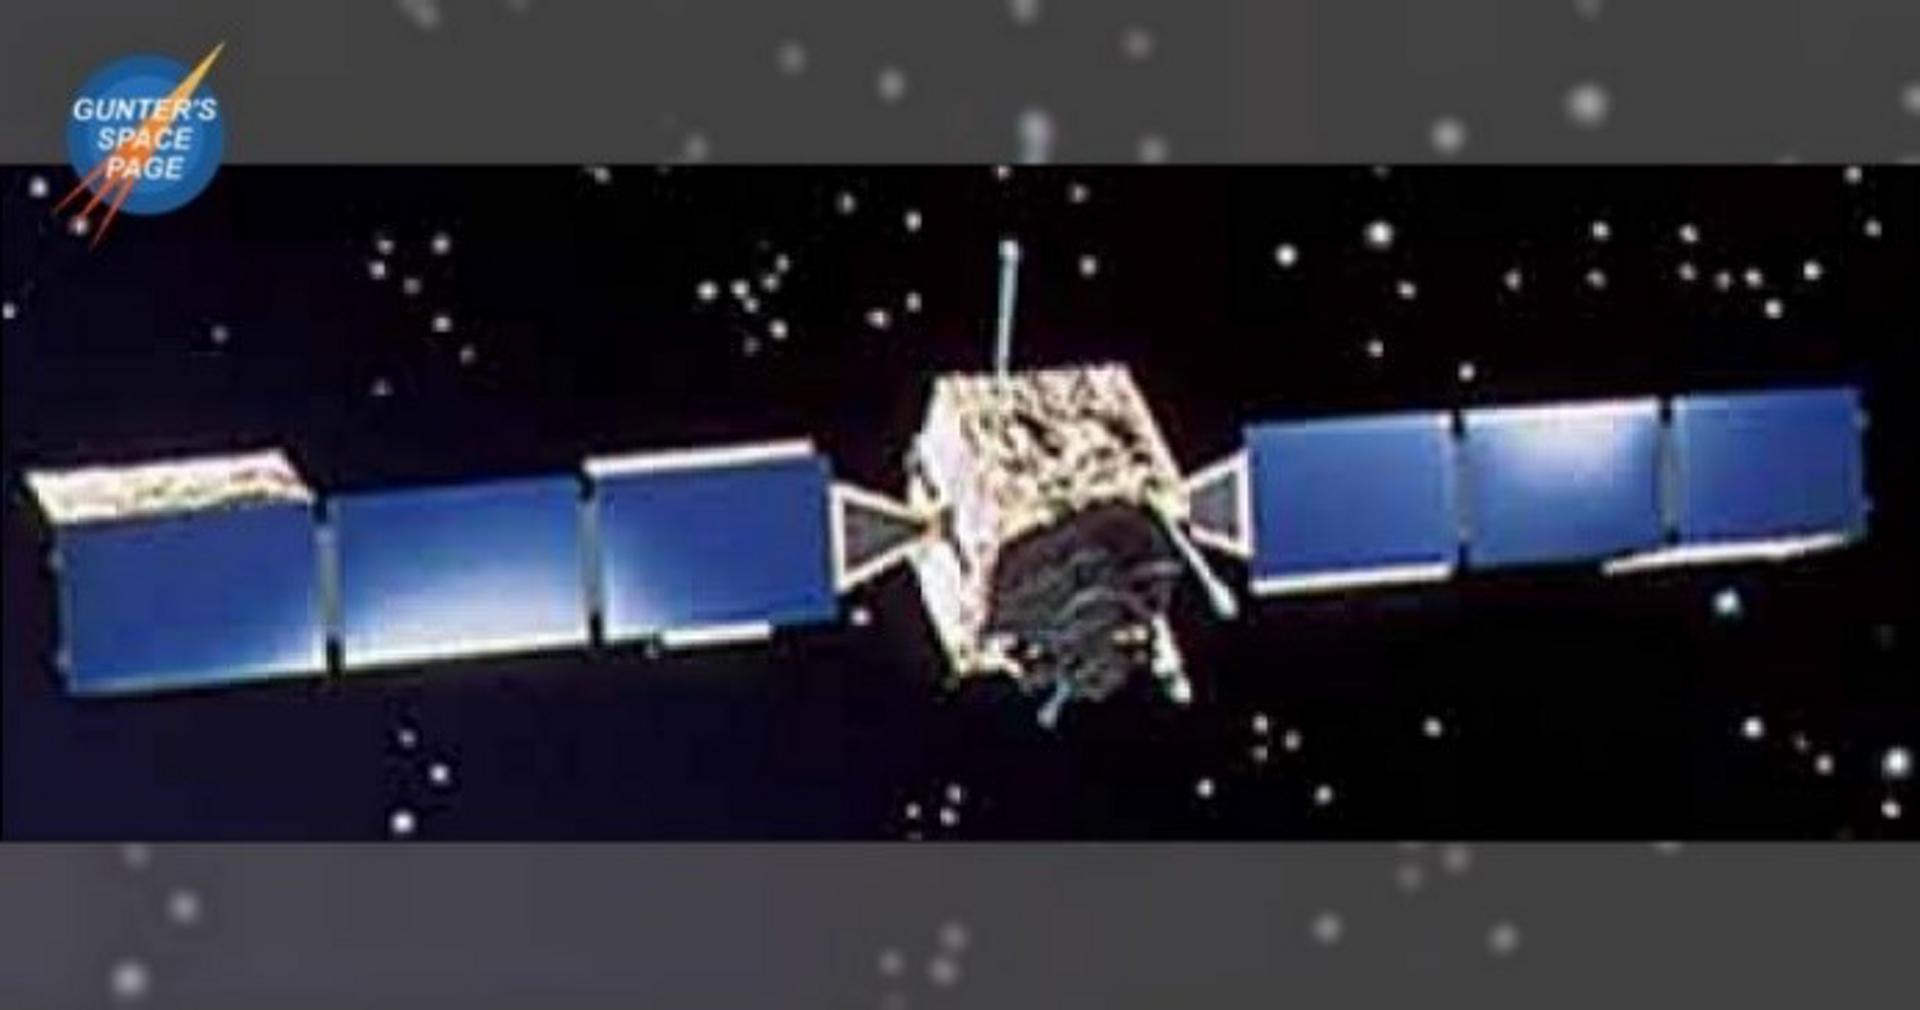 Inmarsat 2 F2 Longest Eurostar In Service - Copyright Airbus